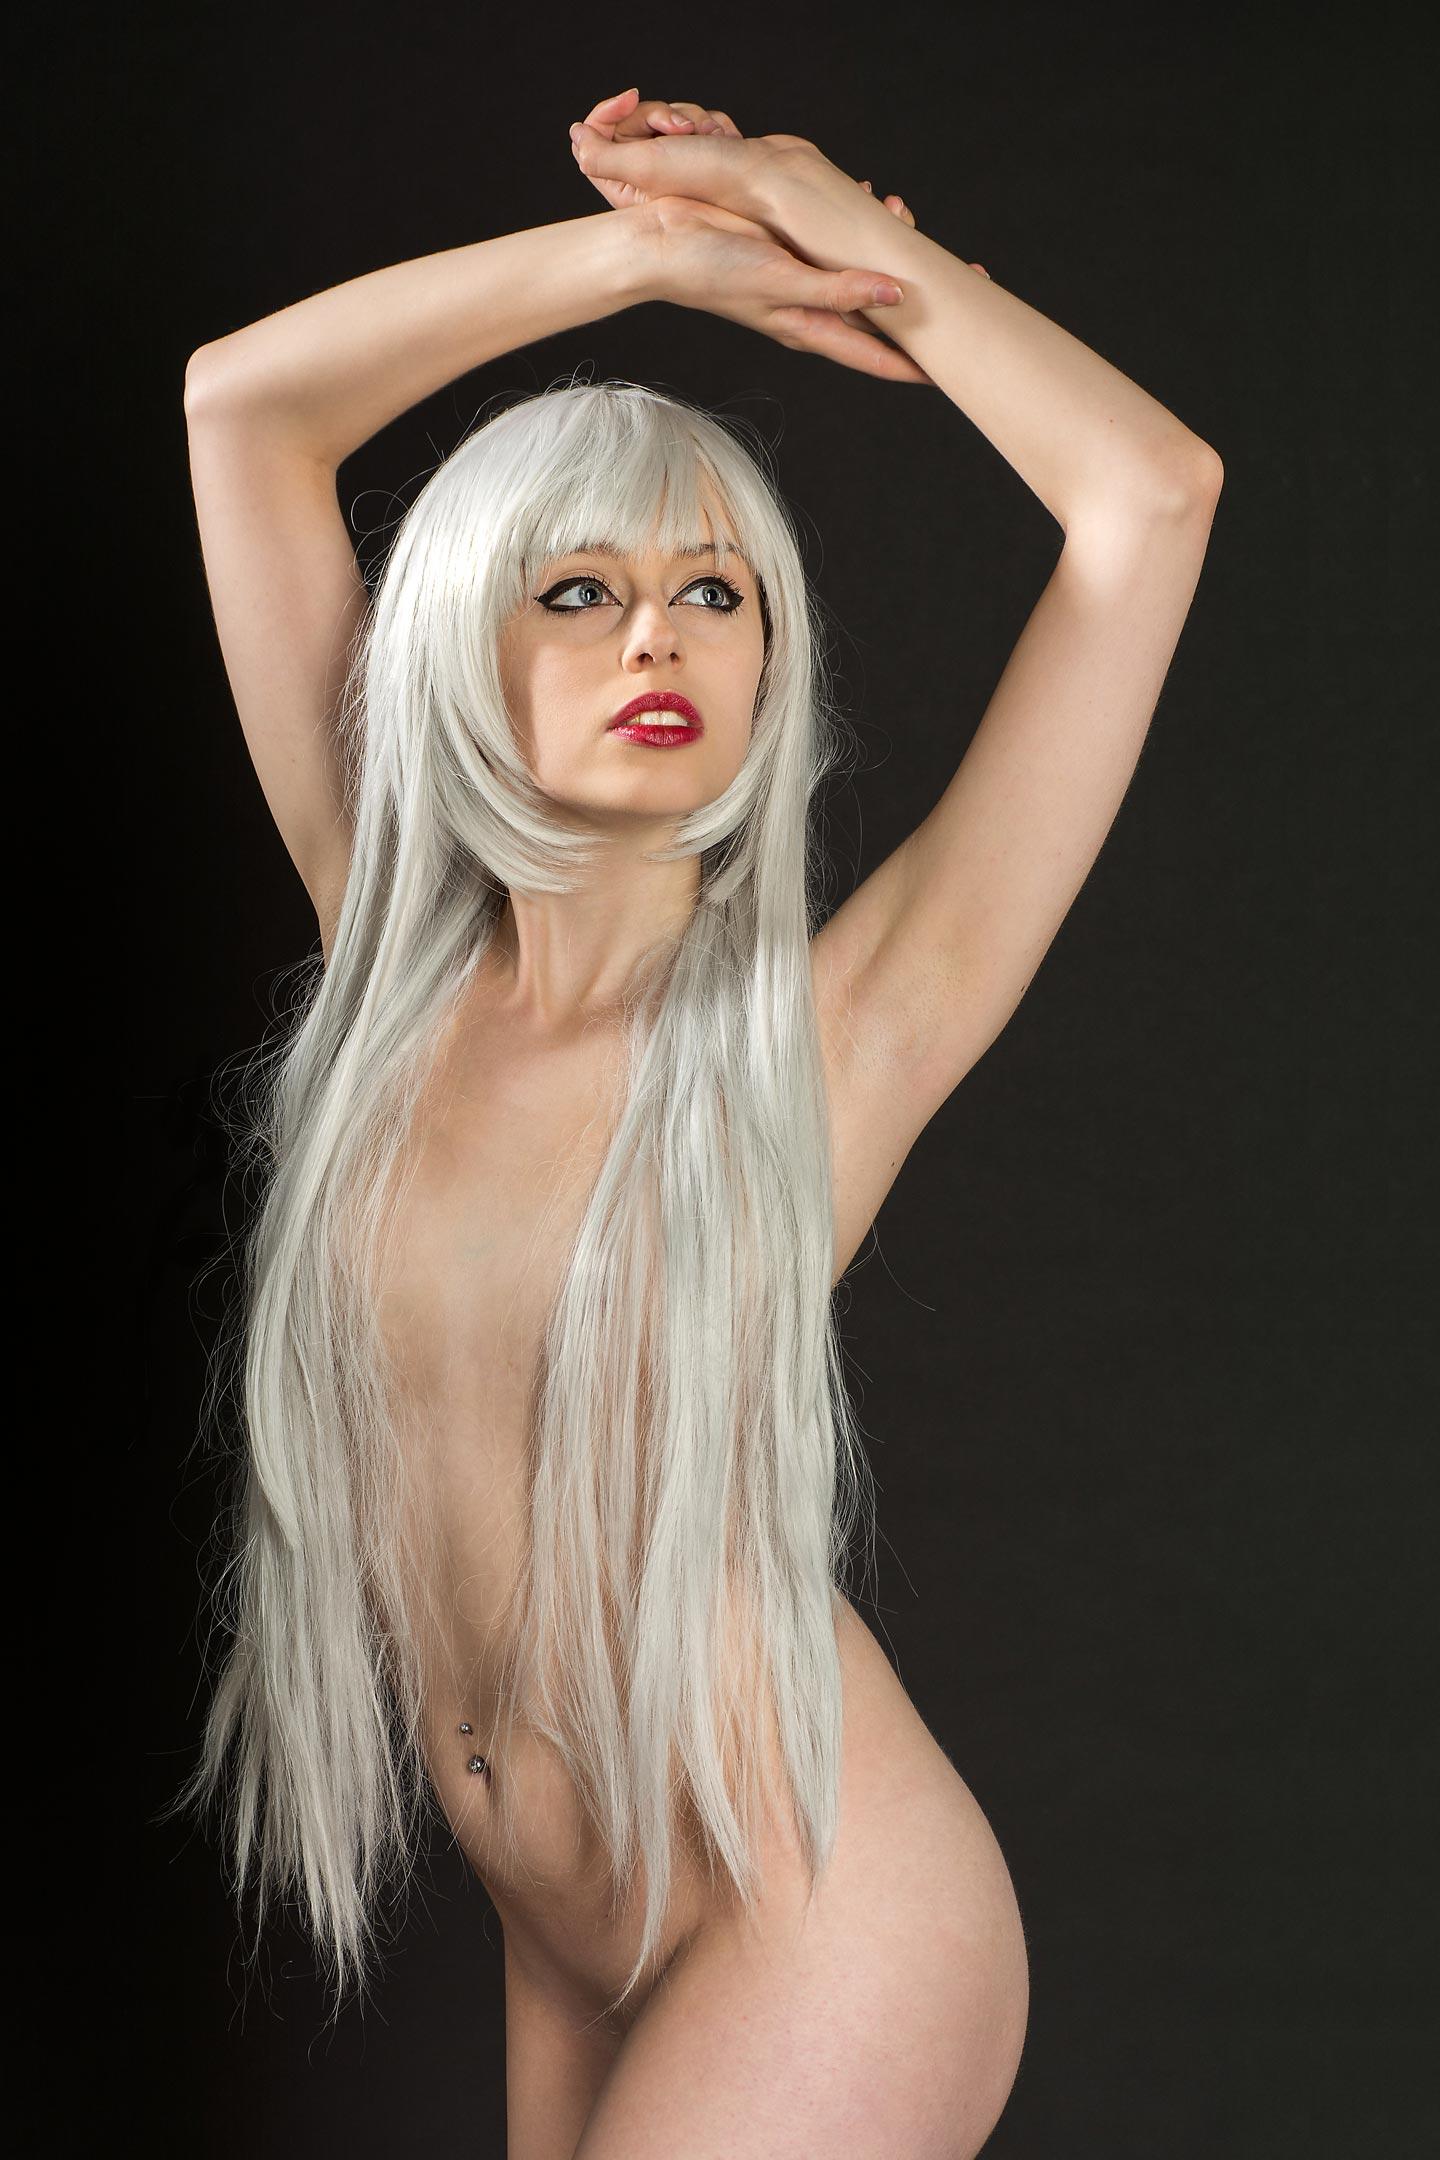 Akt blonde Frau FotoEdmundo